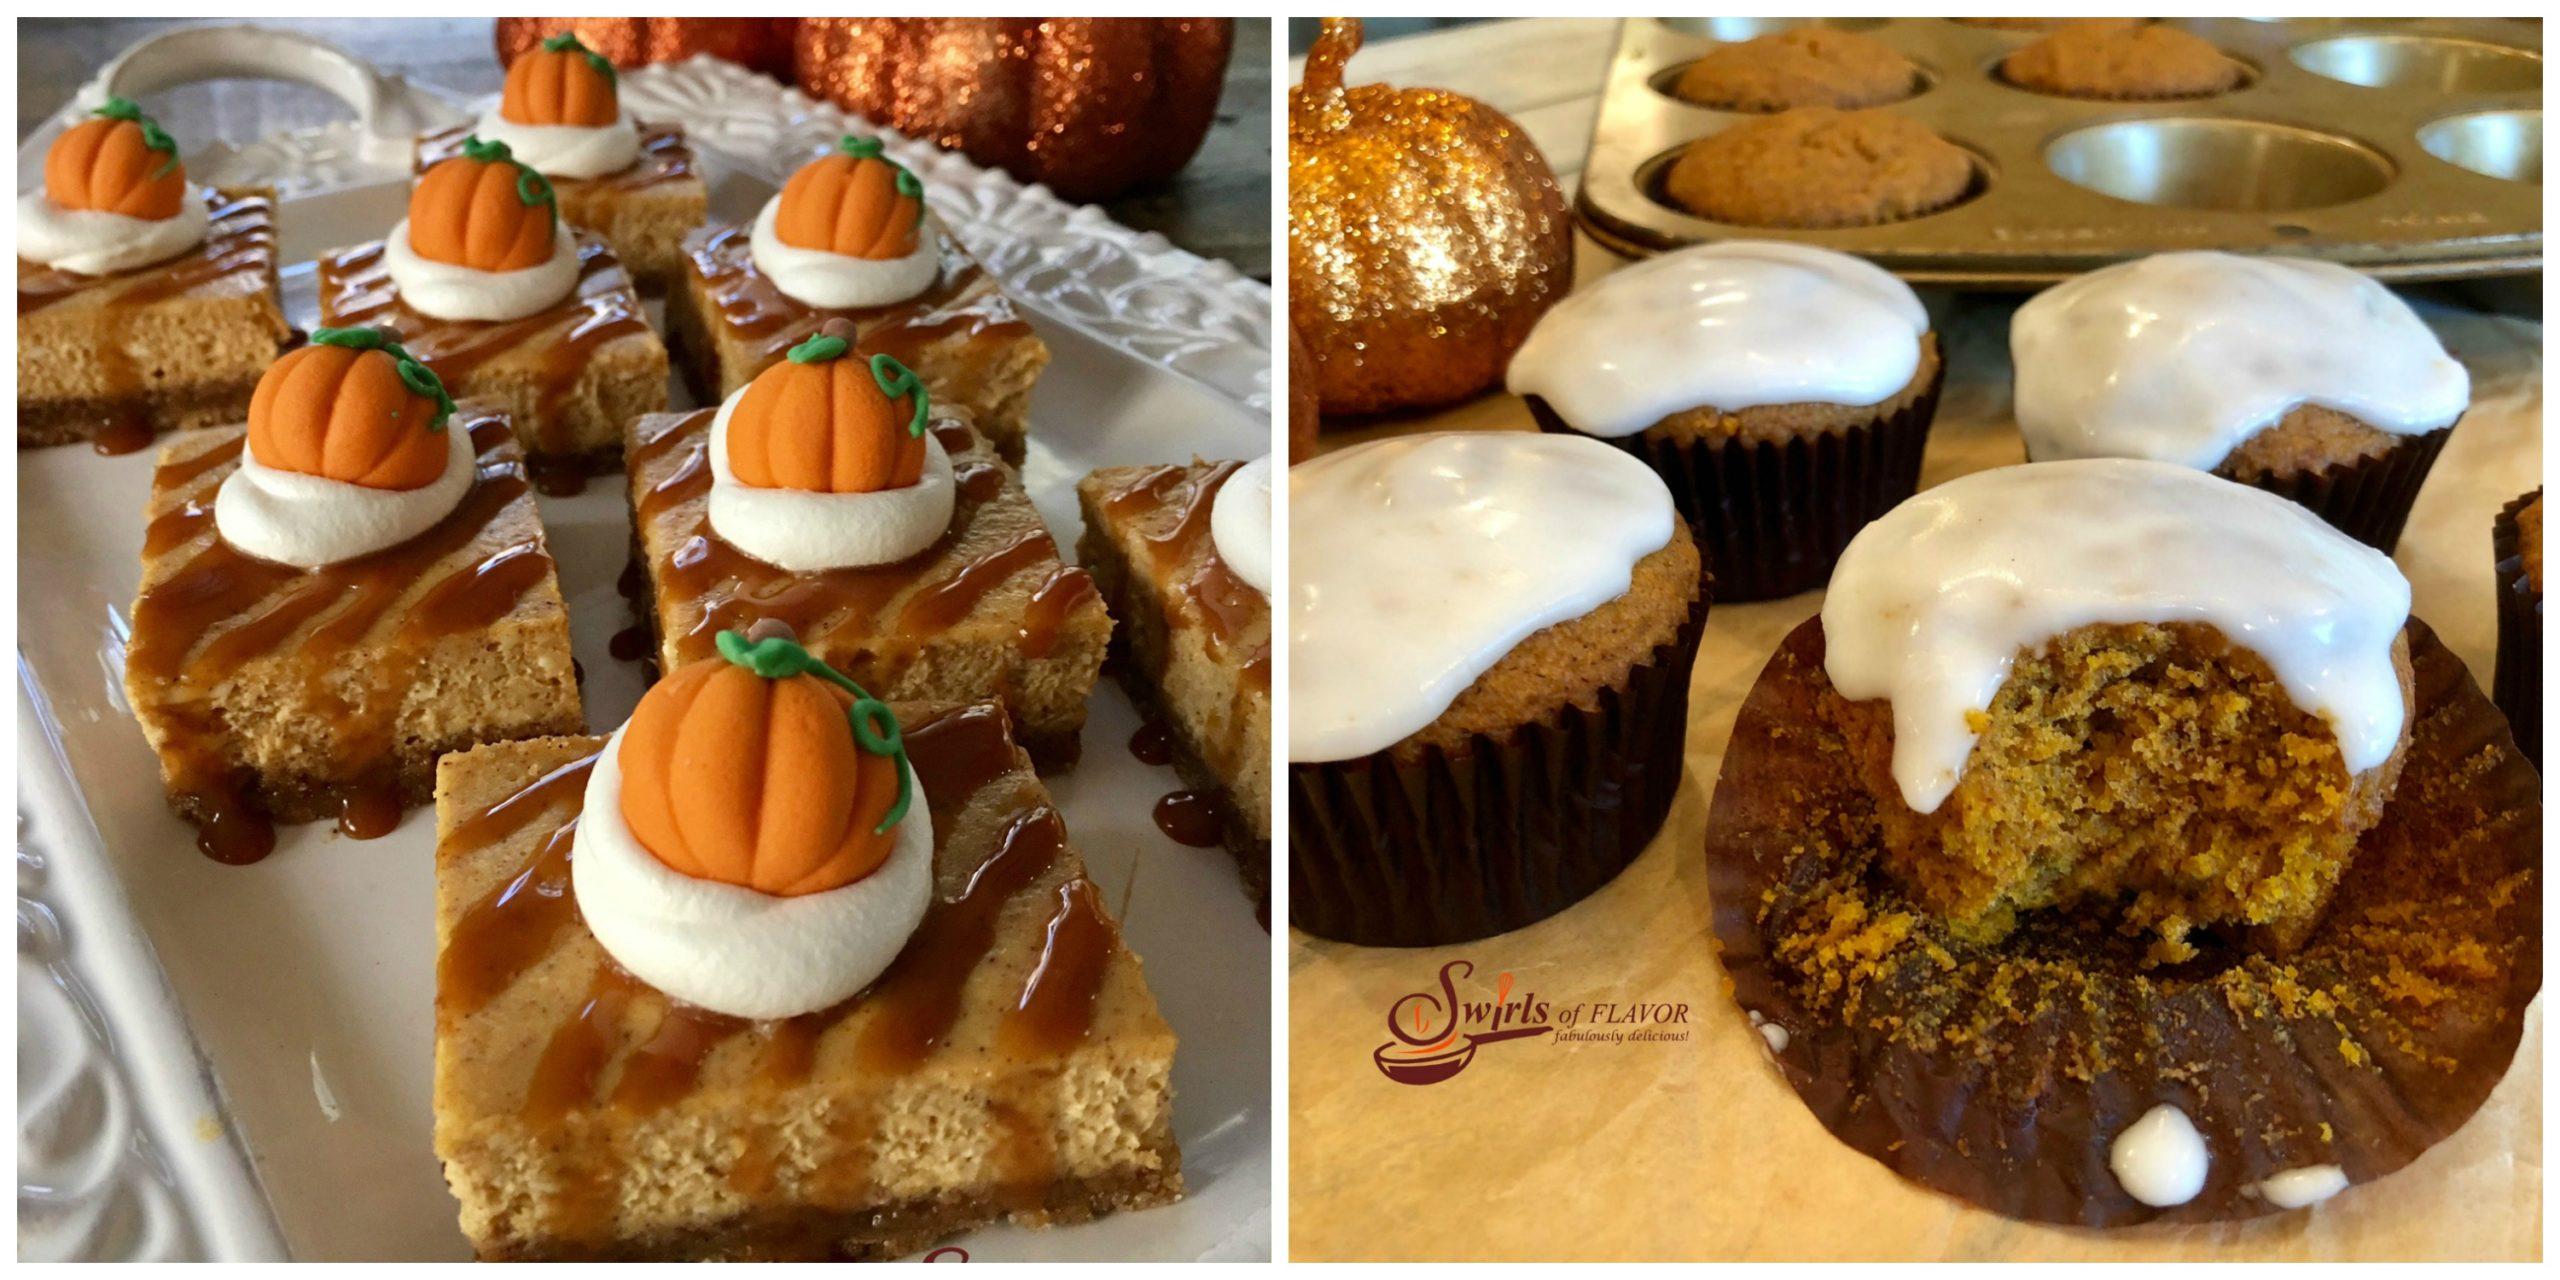 Pumpkin Cheesecake Bars and Pumpkin Muffins